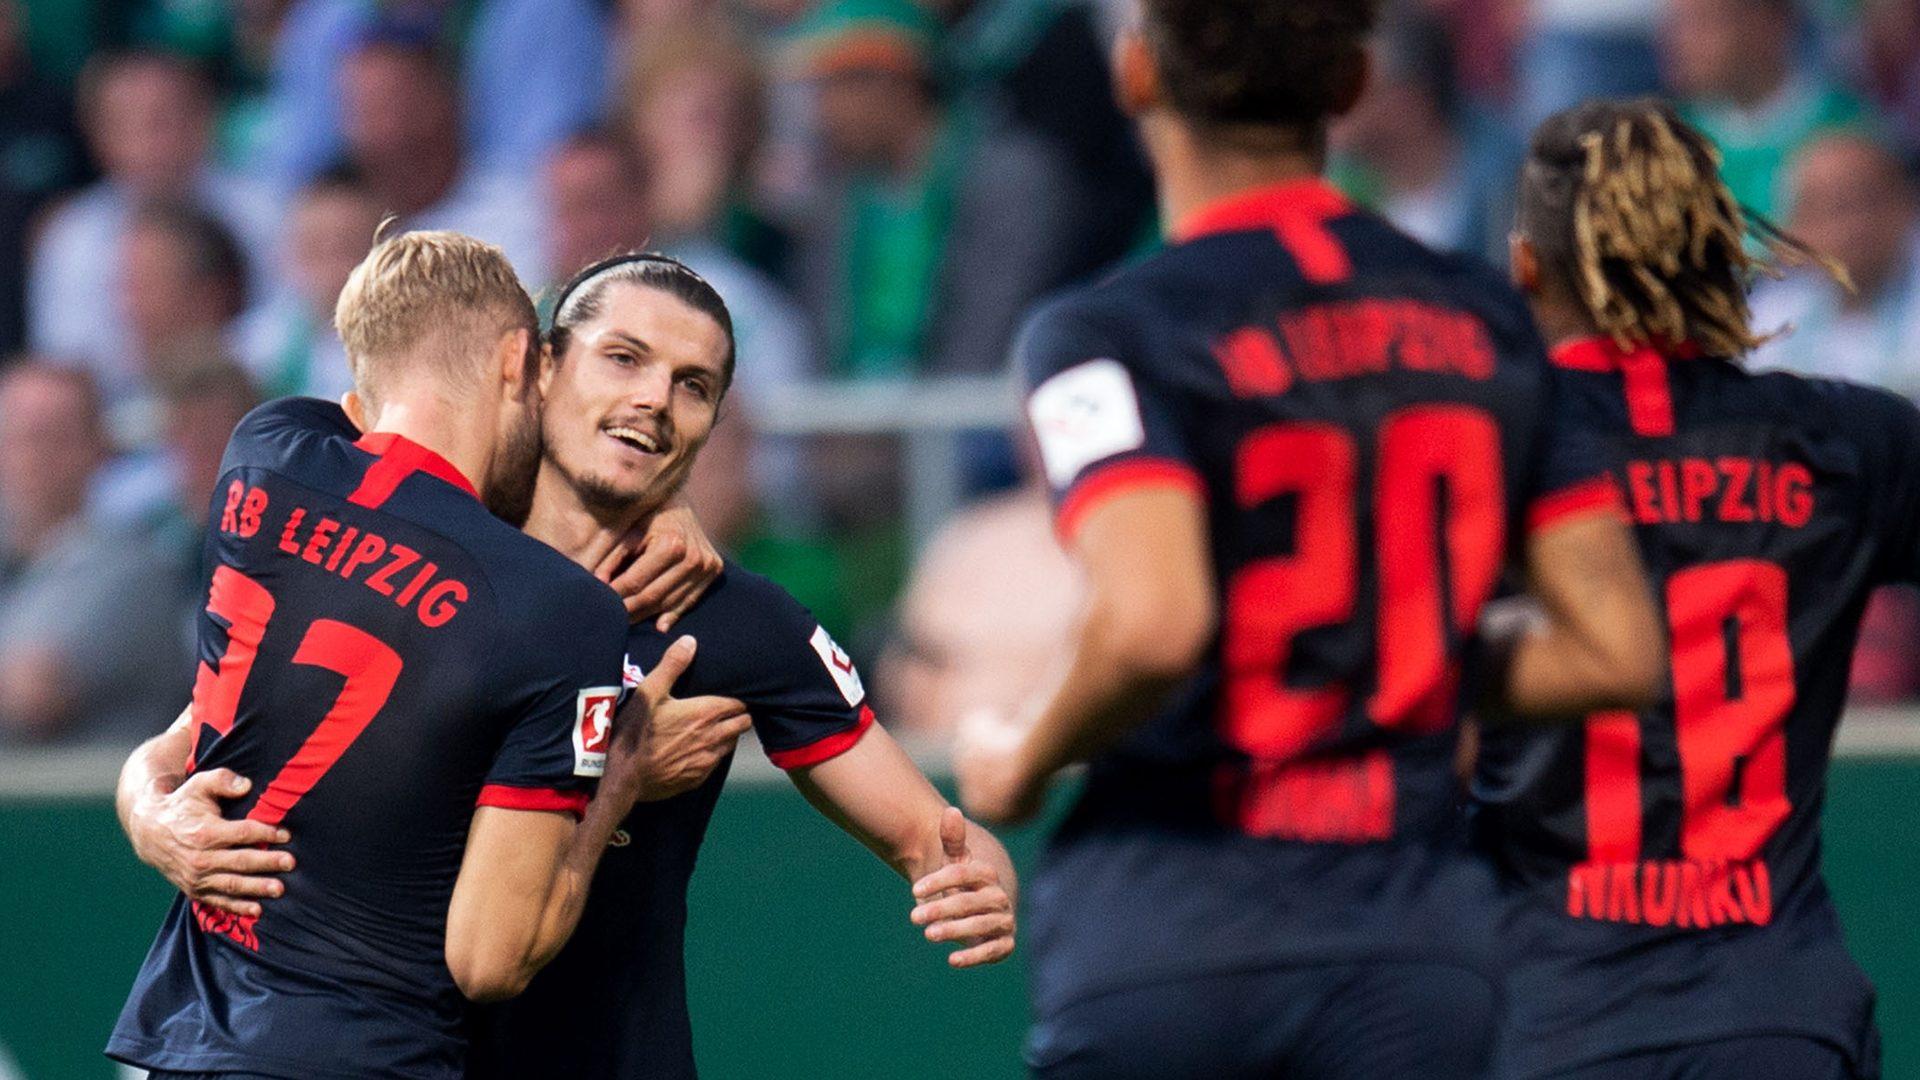 10-man Leipzig beat Bremen to go top